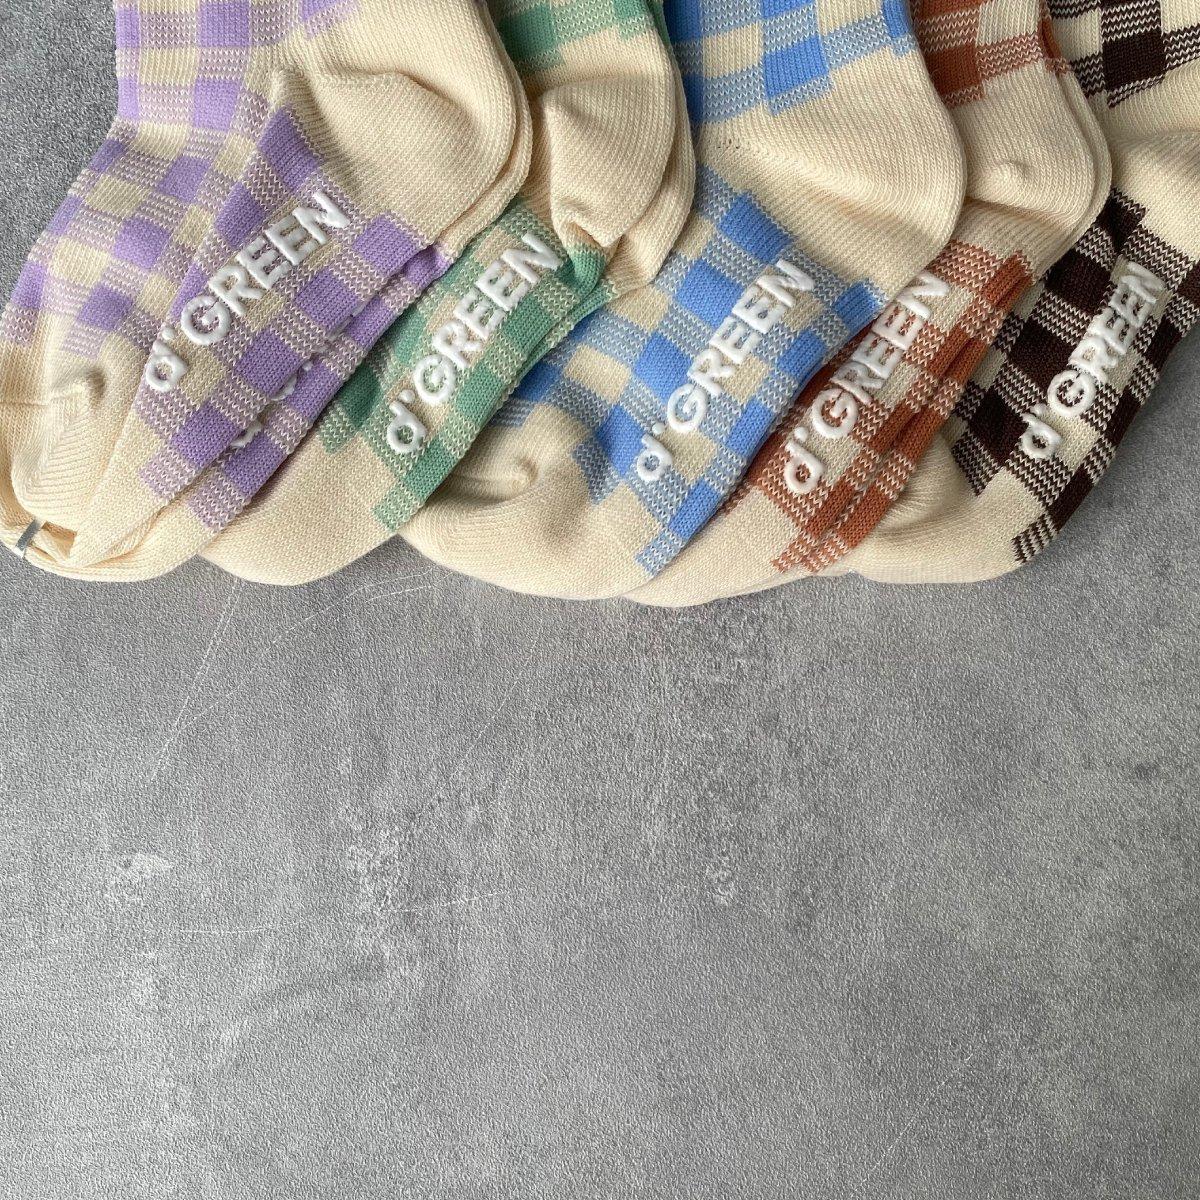 【BABY】Natural Check Socks 詳細画像8